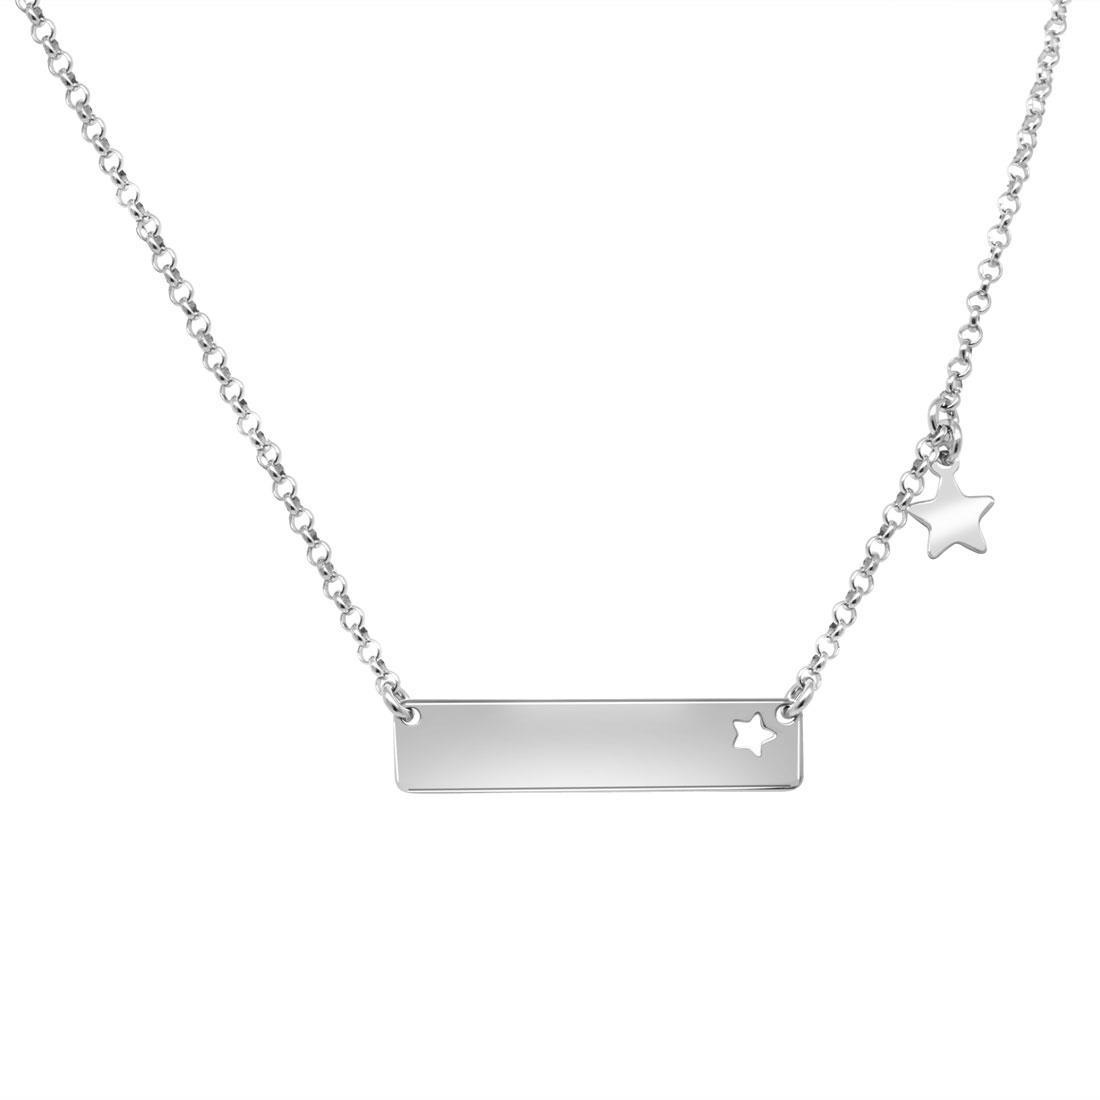 Collana in argento con targhetta - ORO&CO